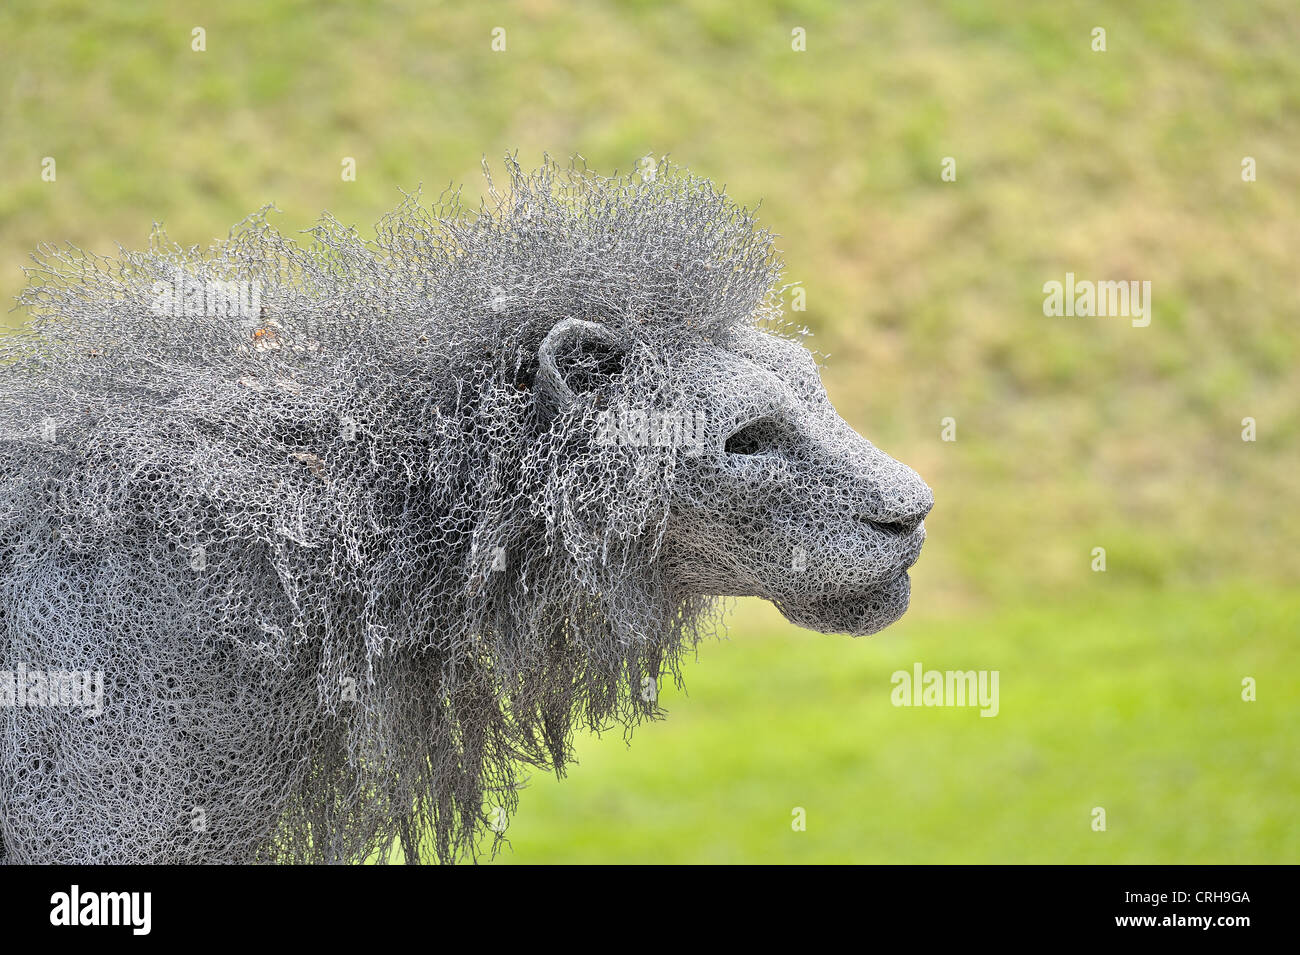 Drahtskulptur Stockfotos Und Bilder Kaufen Alamy